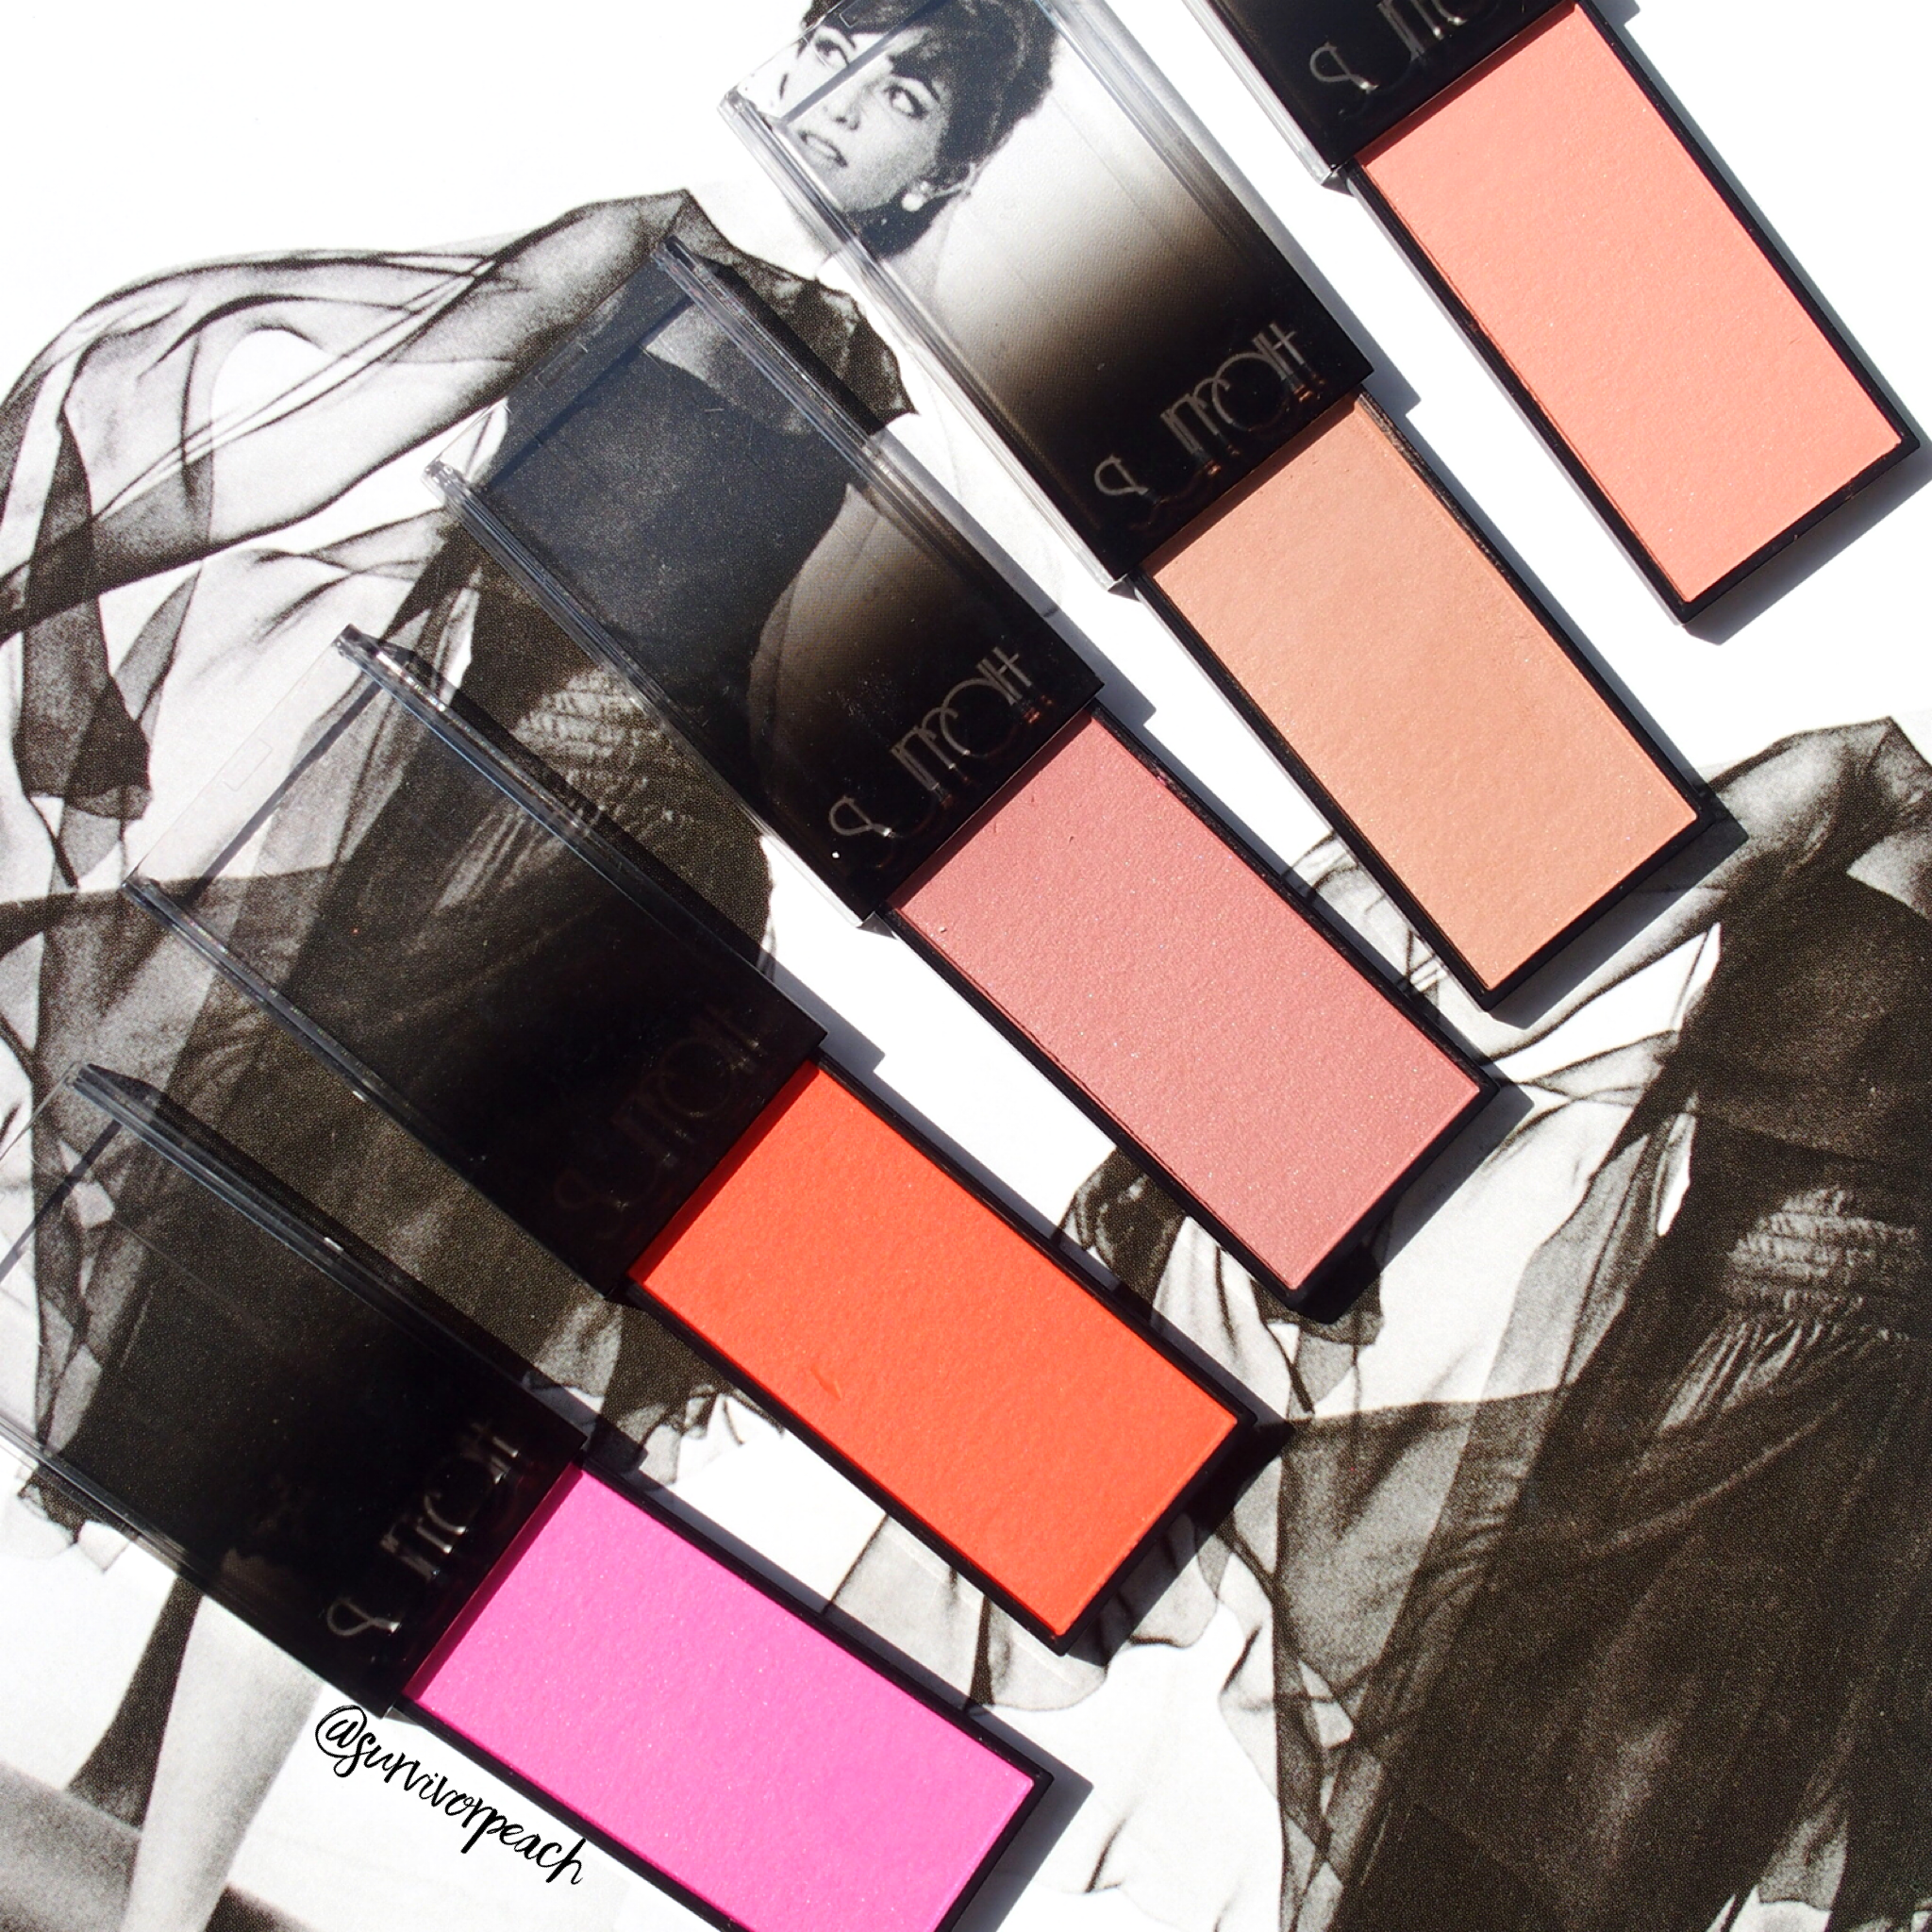 Surratt Astistique Blush in shades La Rosee Du Soir, La Vie In Rose, Parfait, Brillante Idee, and Se Pomponer